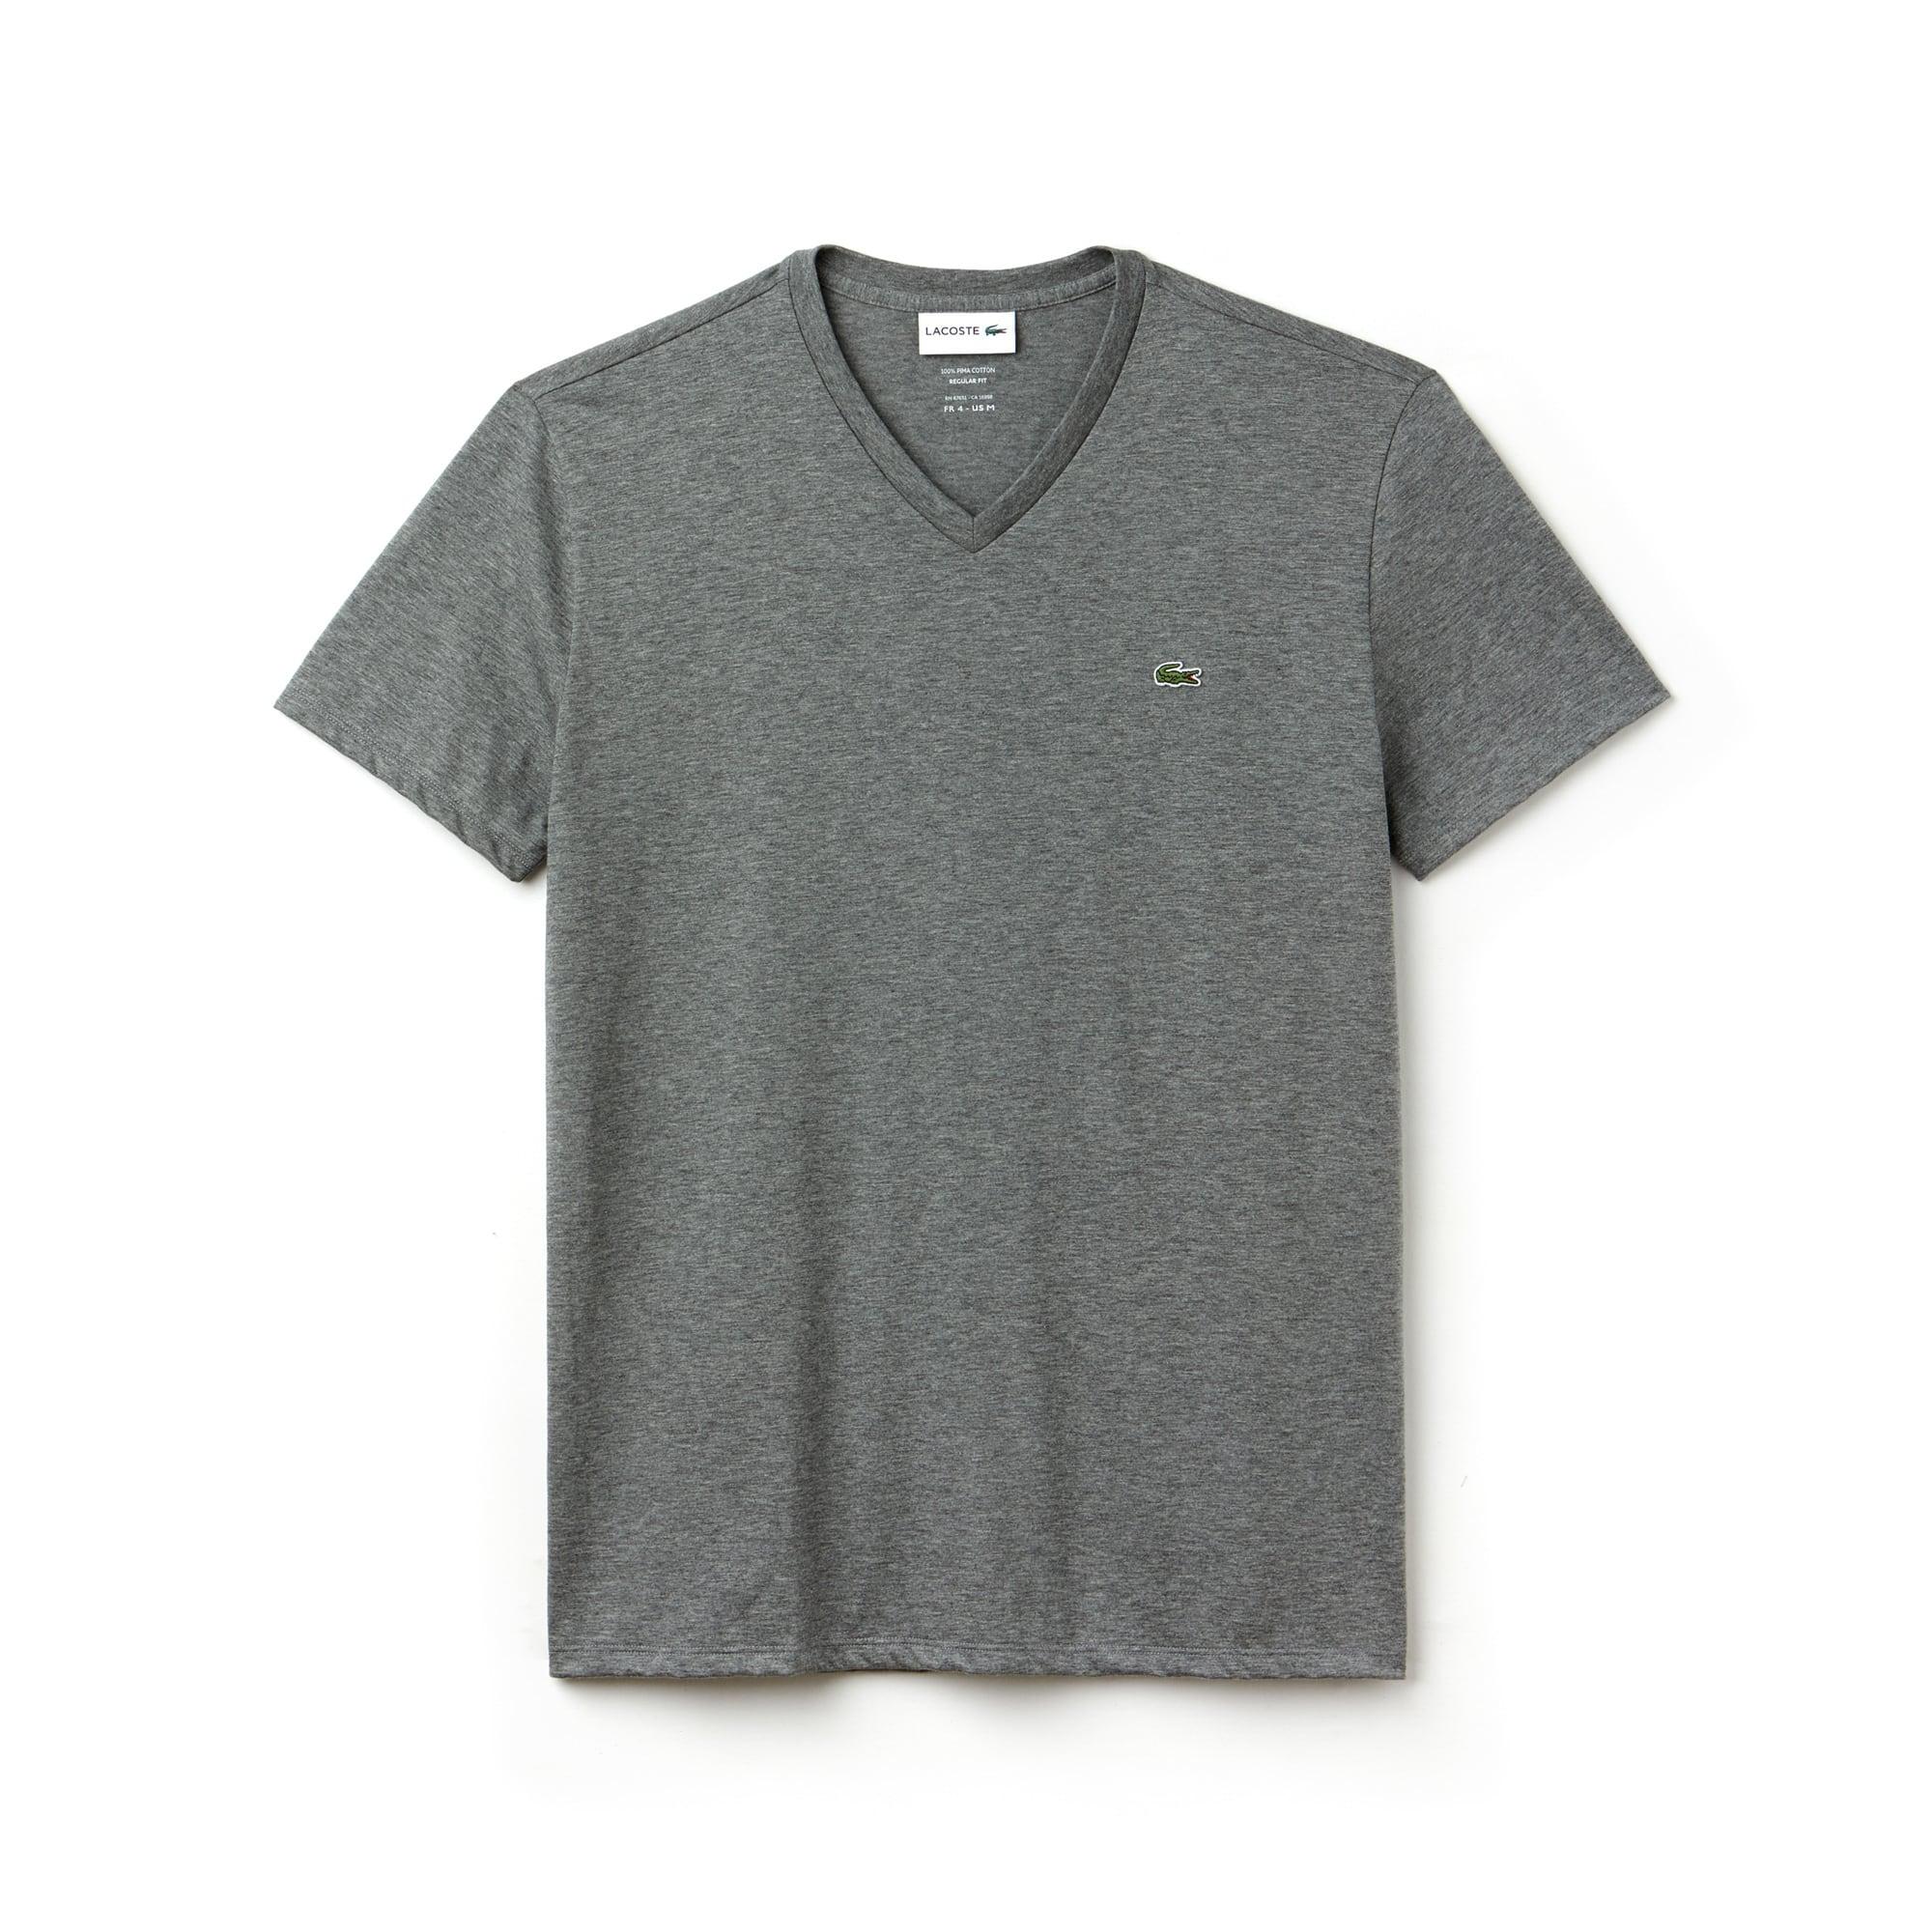 Men's Crew Neck Lacoste Jersey Pima T-shirt